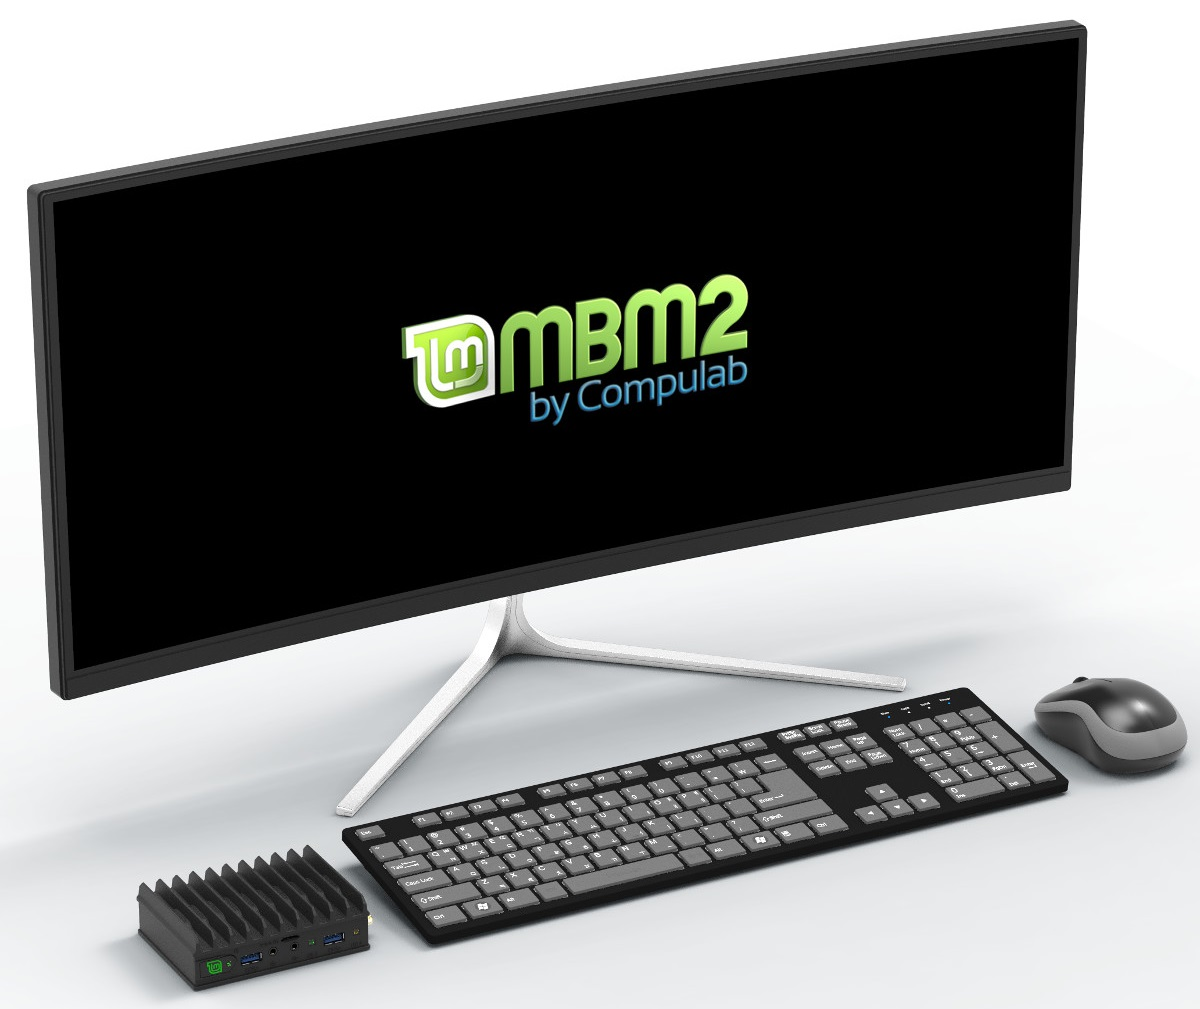 Мини-ПК Compulab MintBox Mini 2 стал доступен для предзаказа